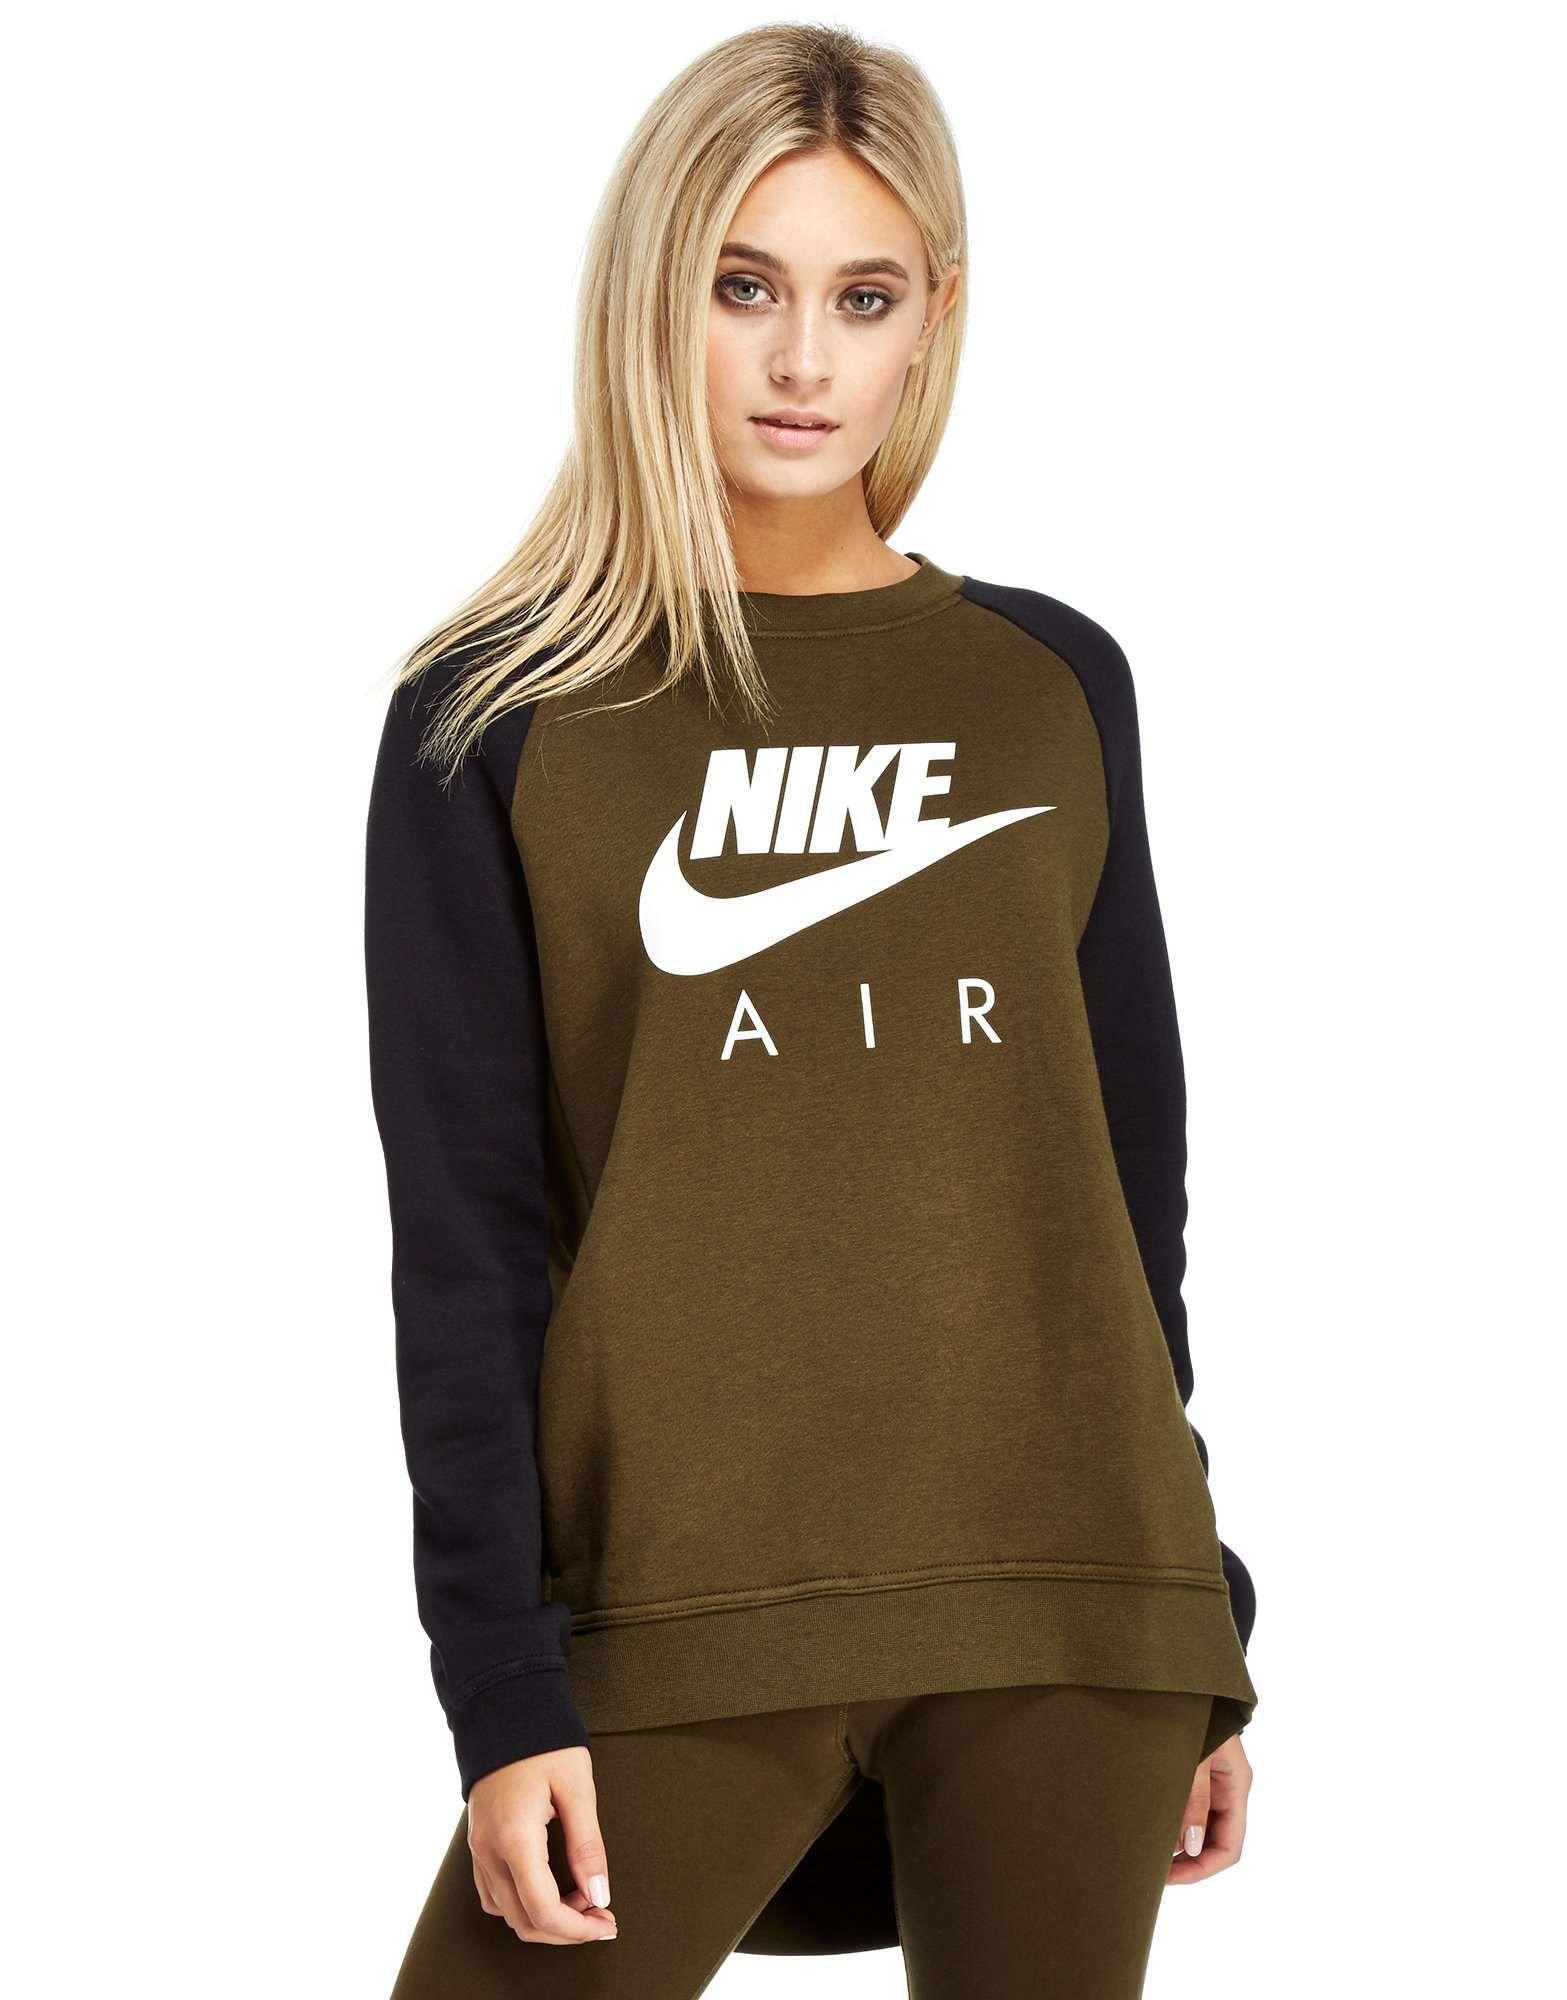 Nike Air Crew Sweatshirt Shop online for Nike Air Crew